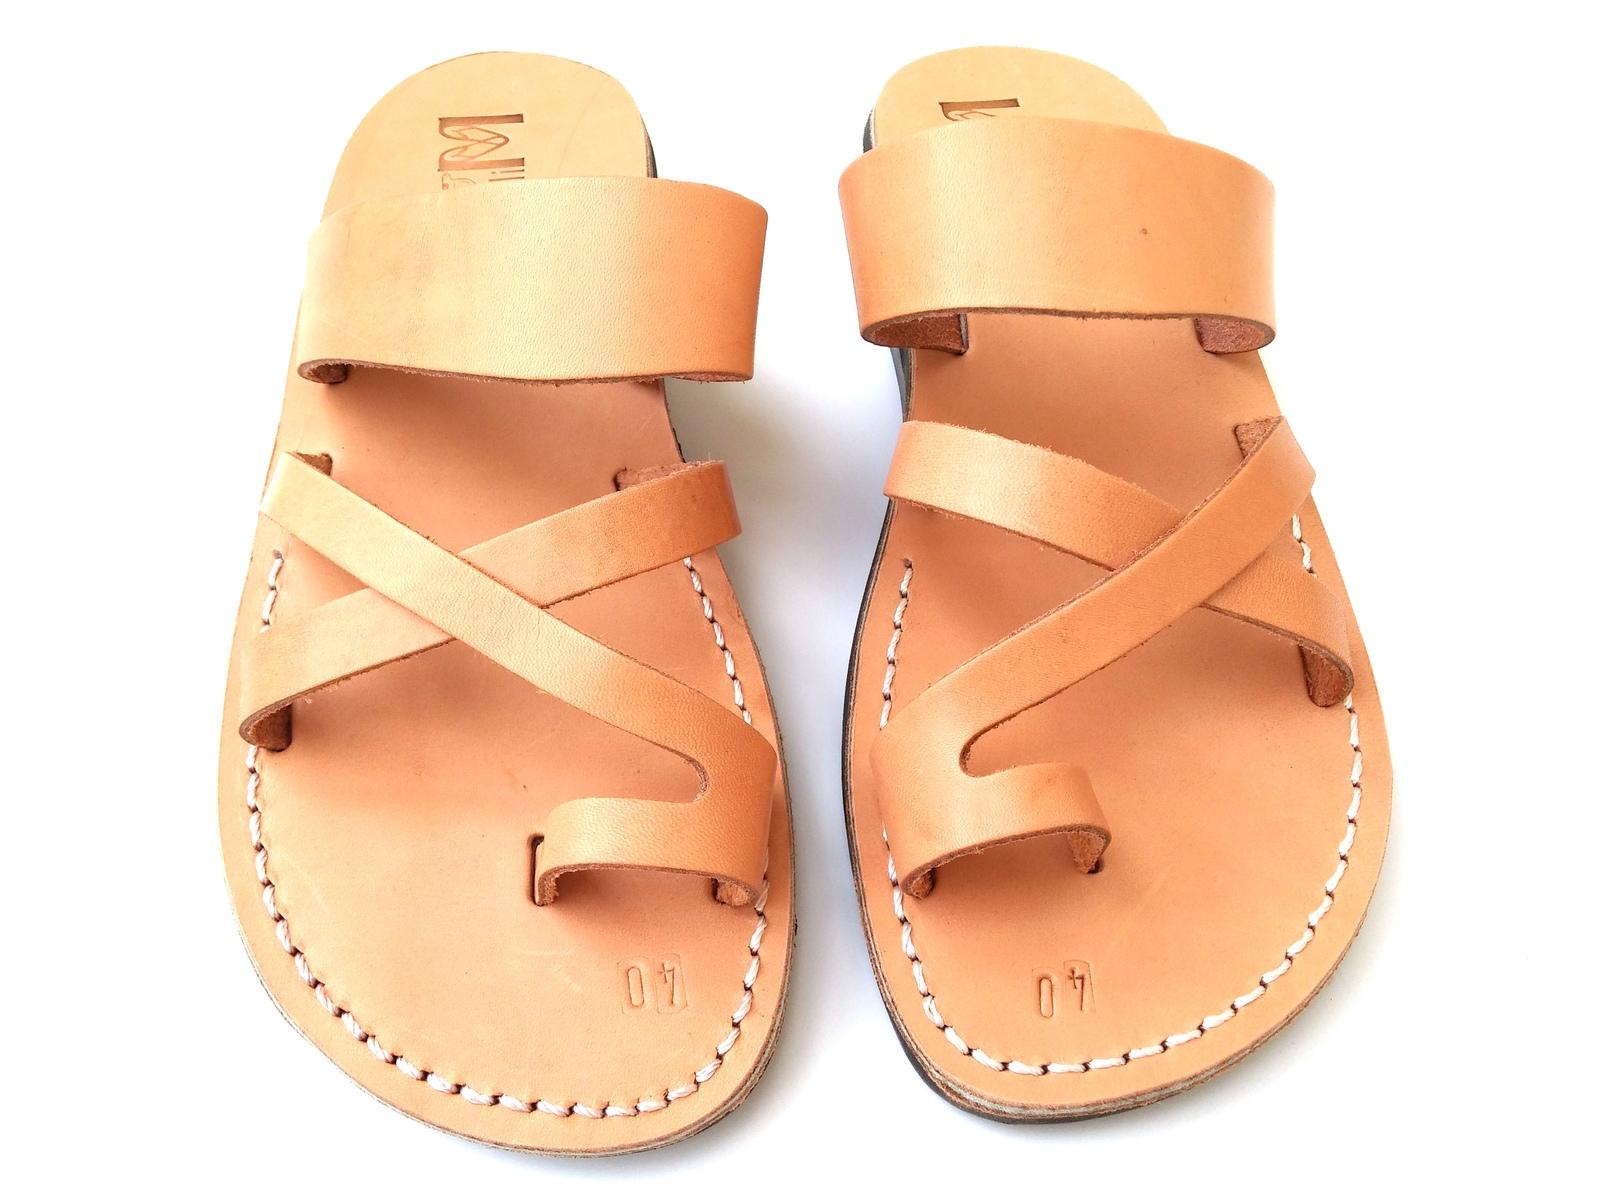 Leather Sandals for Men and Women ROMAN by SANDALIM Biblical Greek Summer Roman